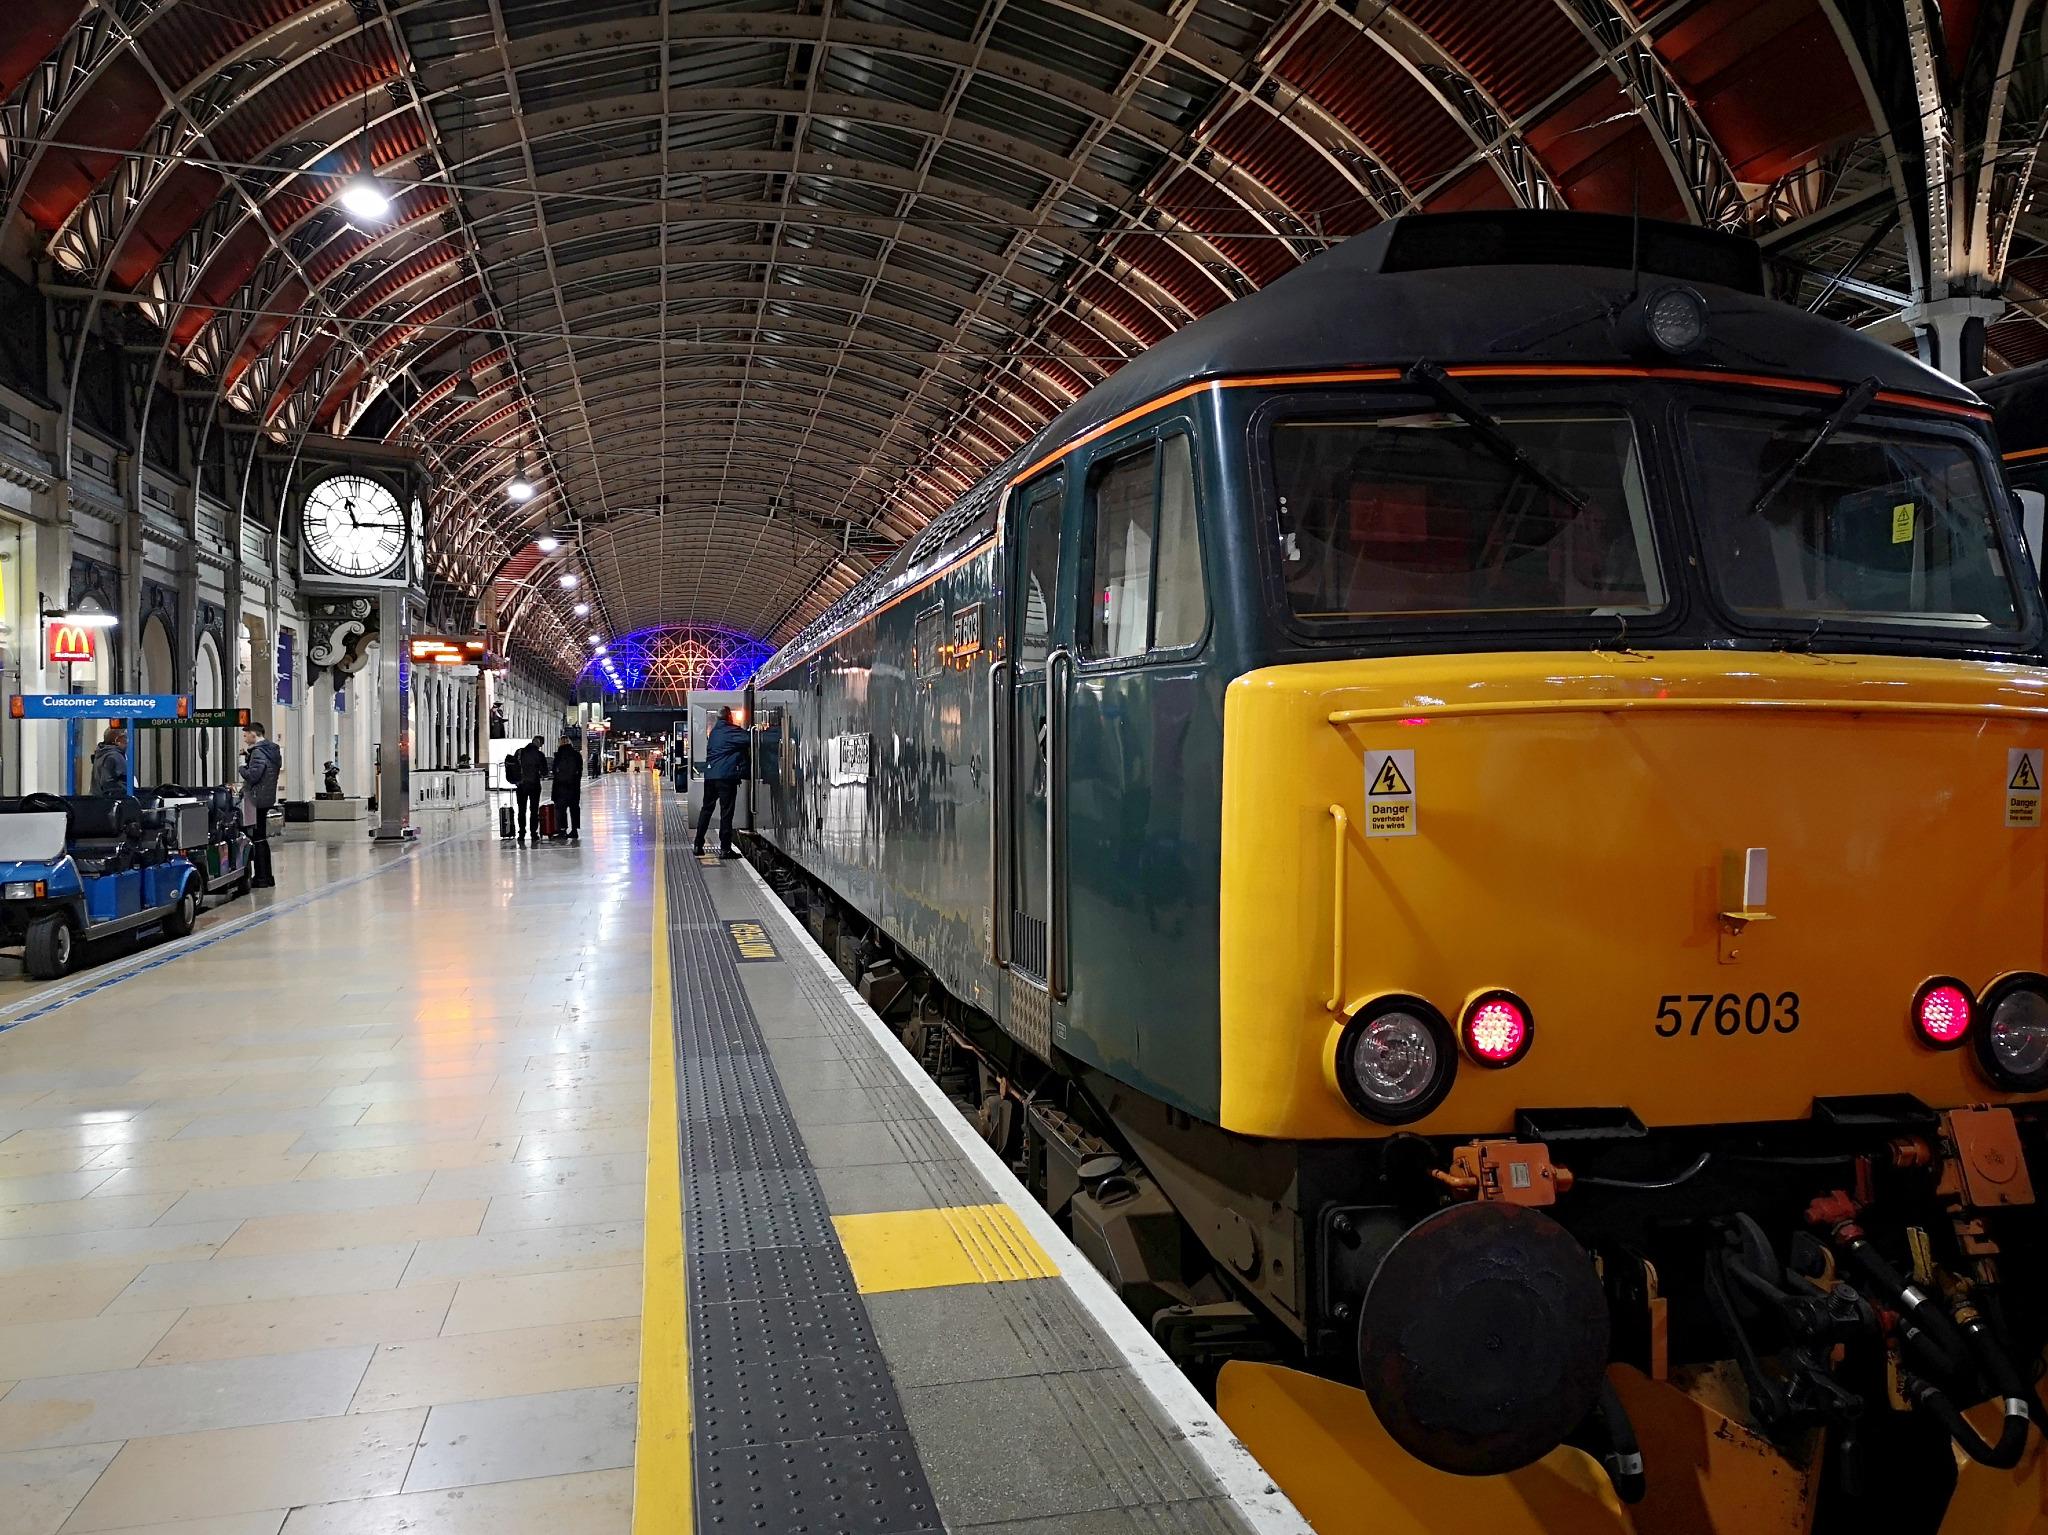 Paddington Station; Boarding the Cornish Riviera night train. Taken by Graham Land, March, 2019